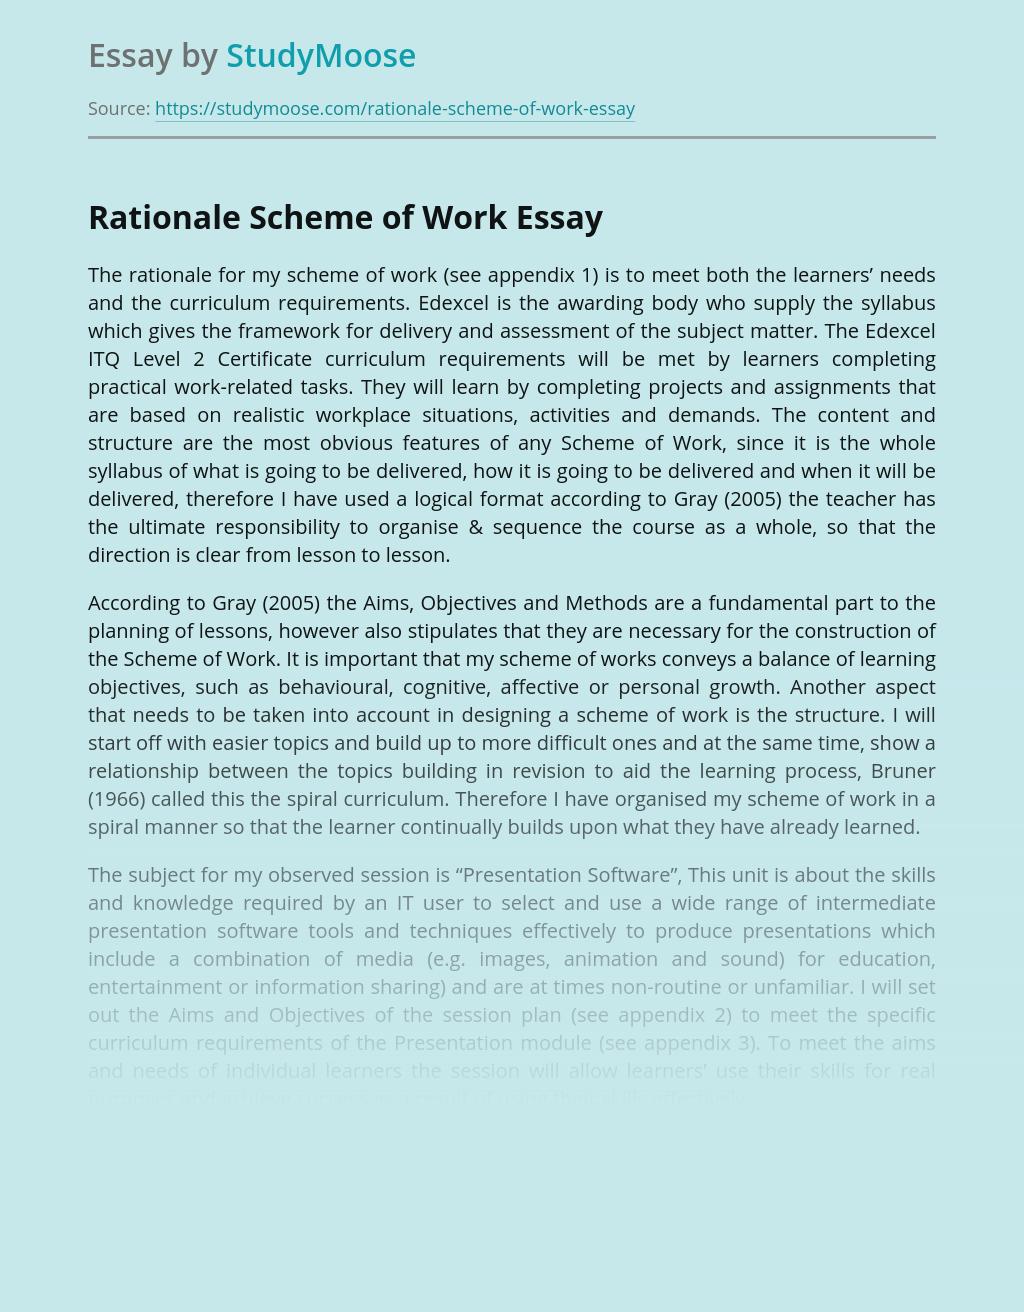 Rationale Scheme of Work